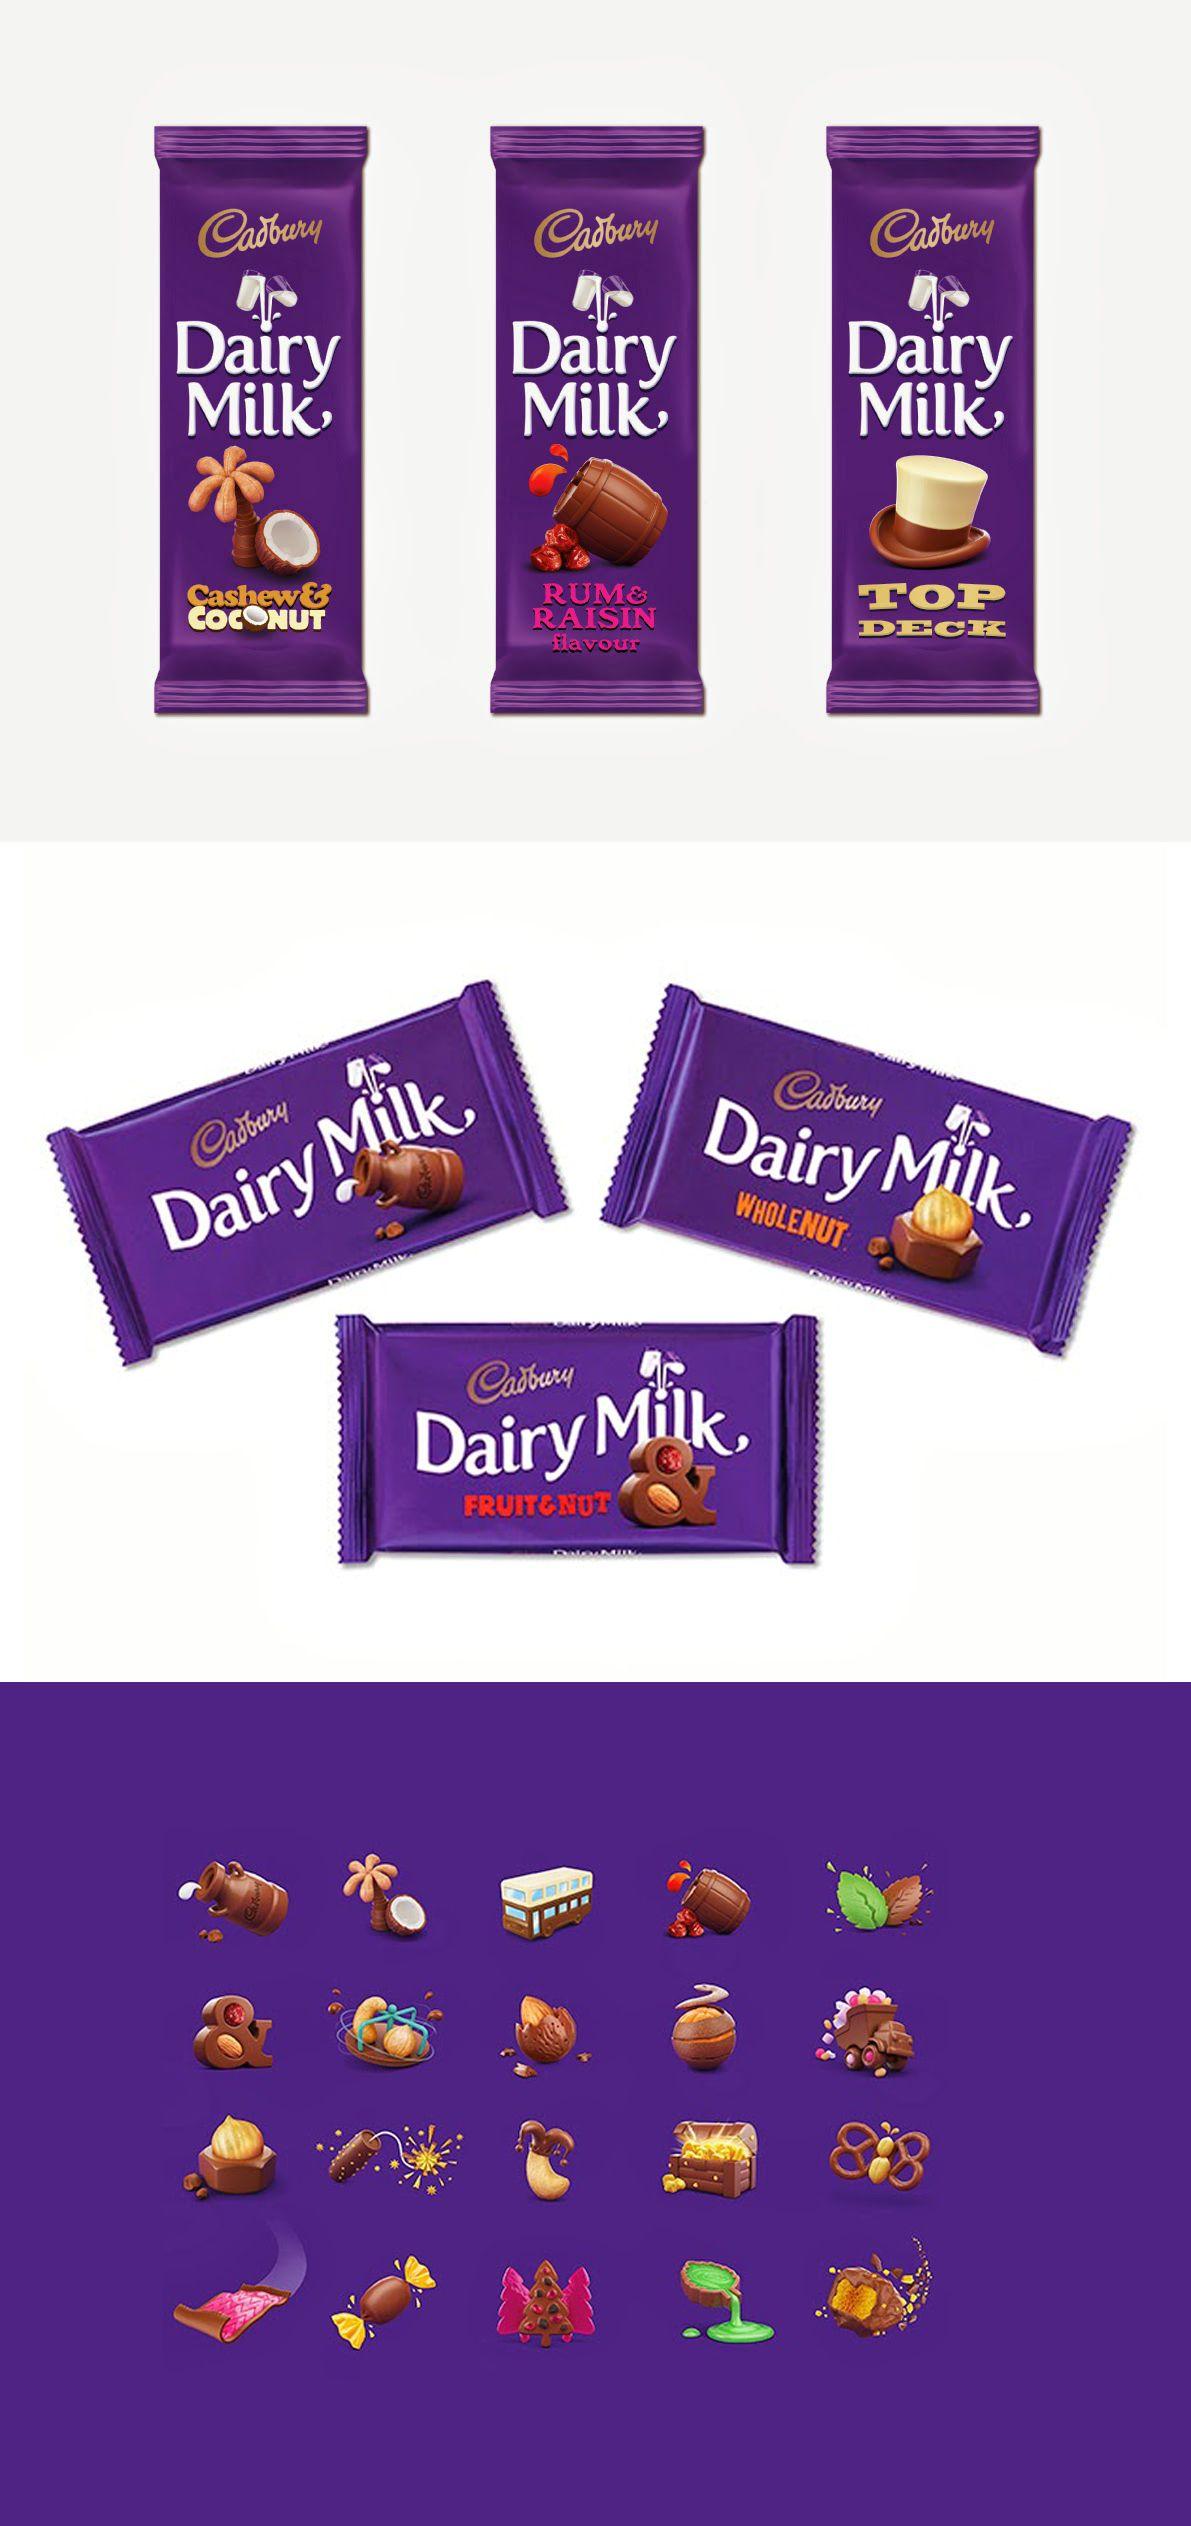 Cadbury Dairy Milk Cadbury s Pinterest